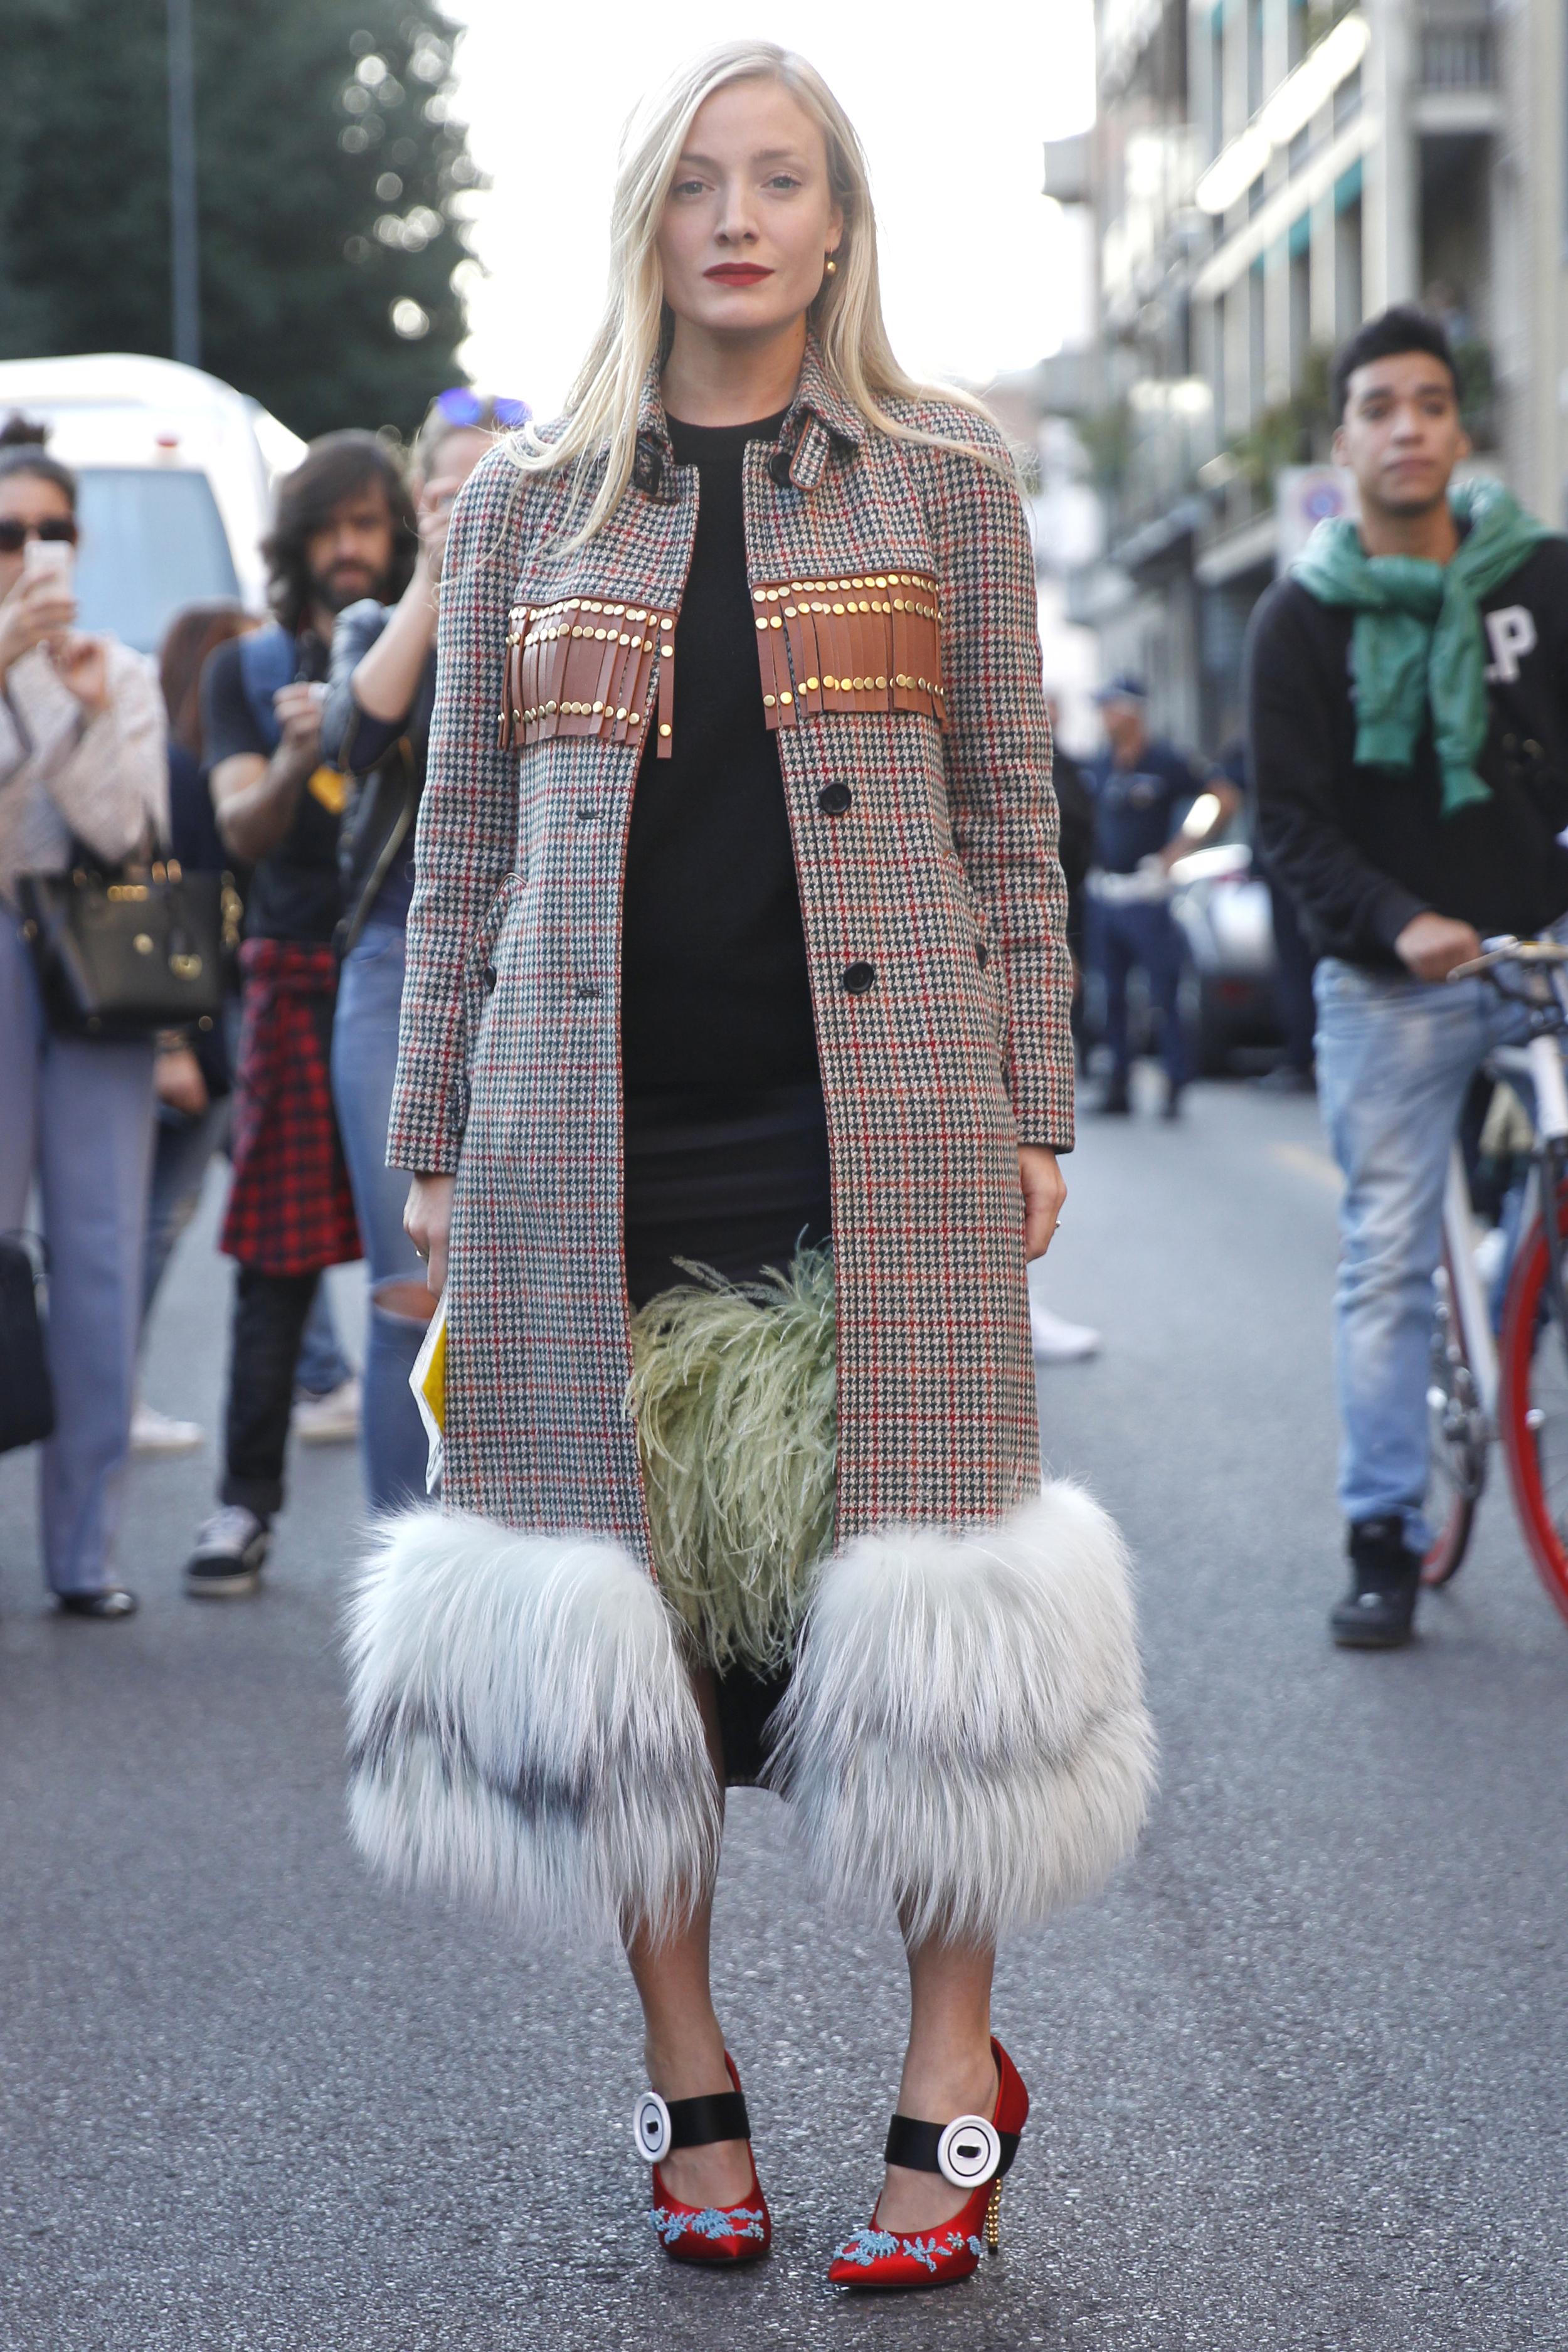 Street Style aus Mailand mit Karo-Mantel